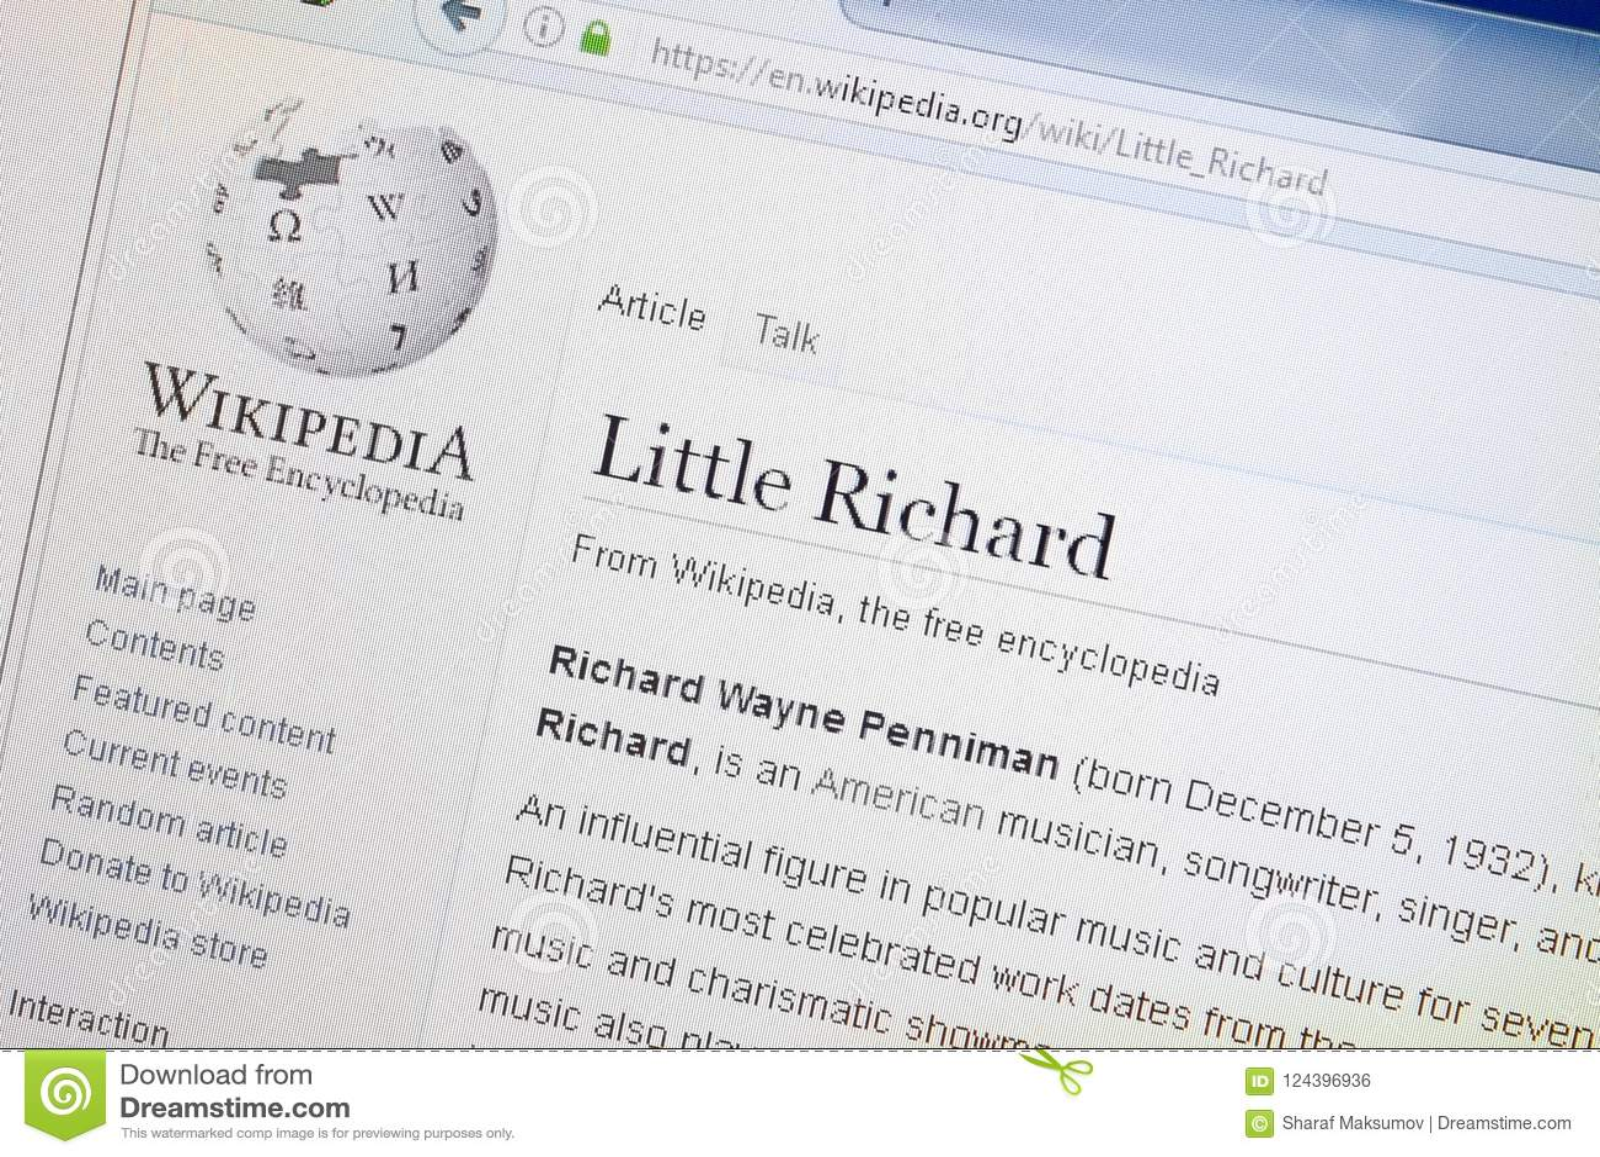 Richard 2018 little Little Richard